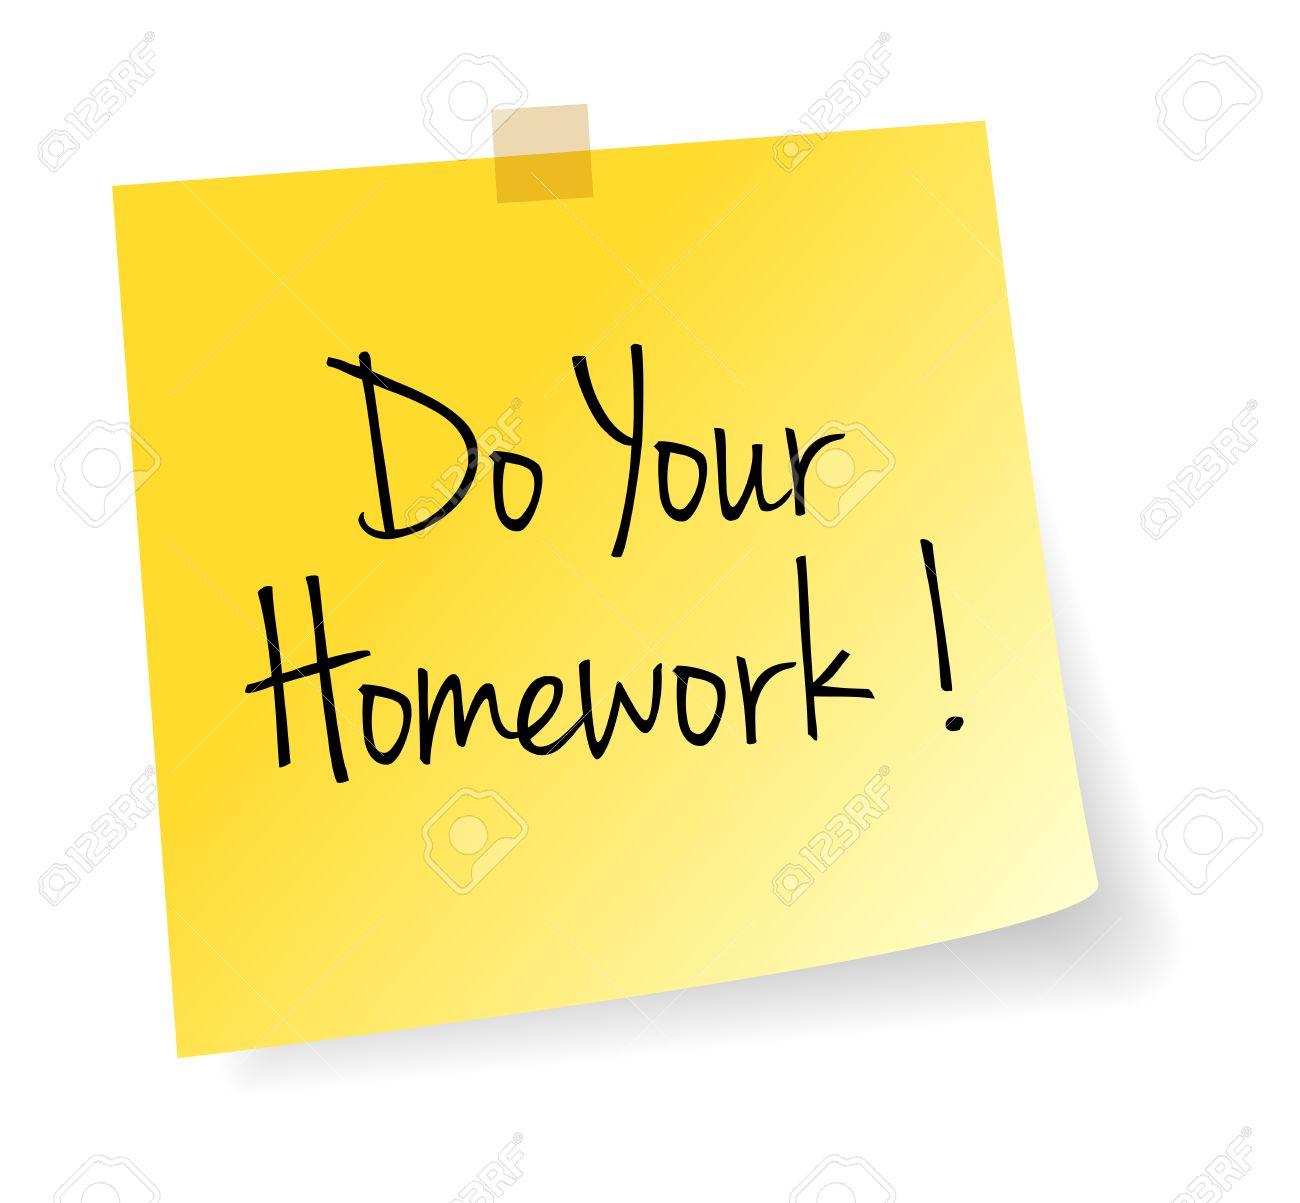 going college essay help online free